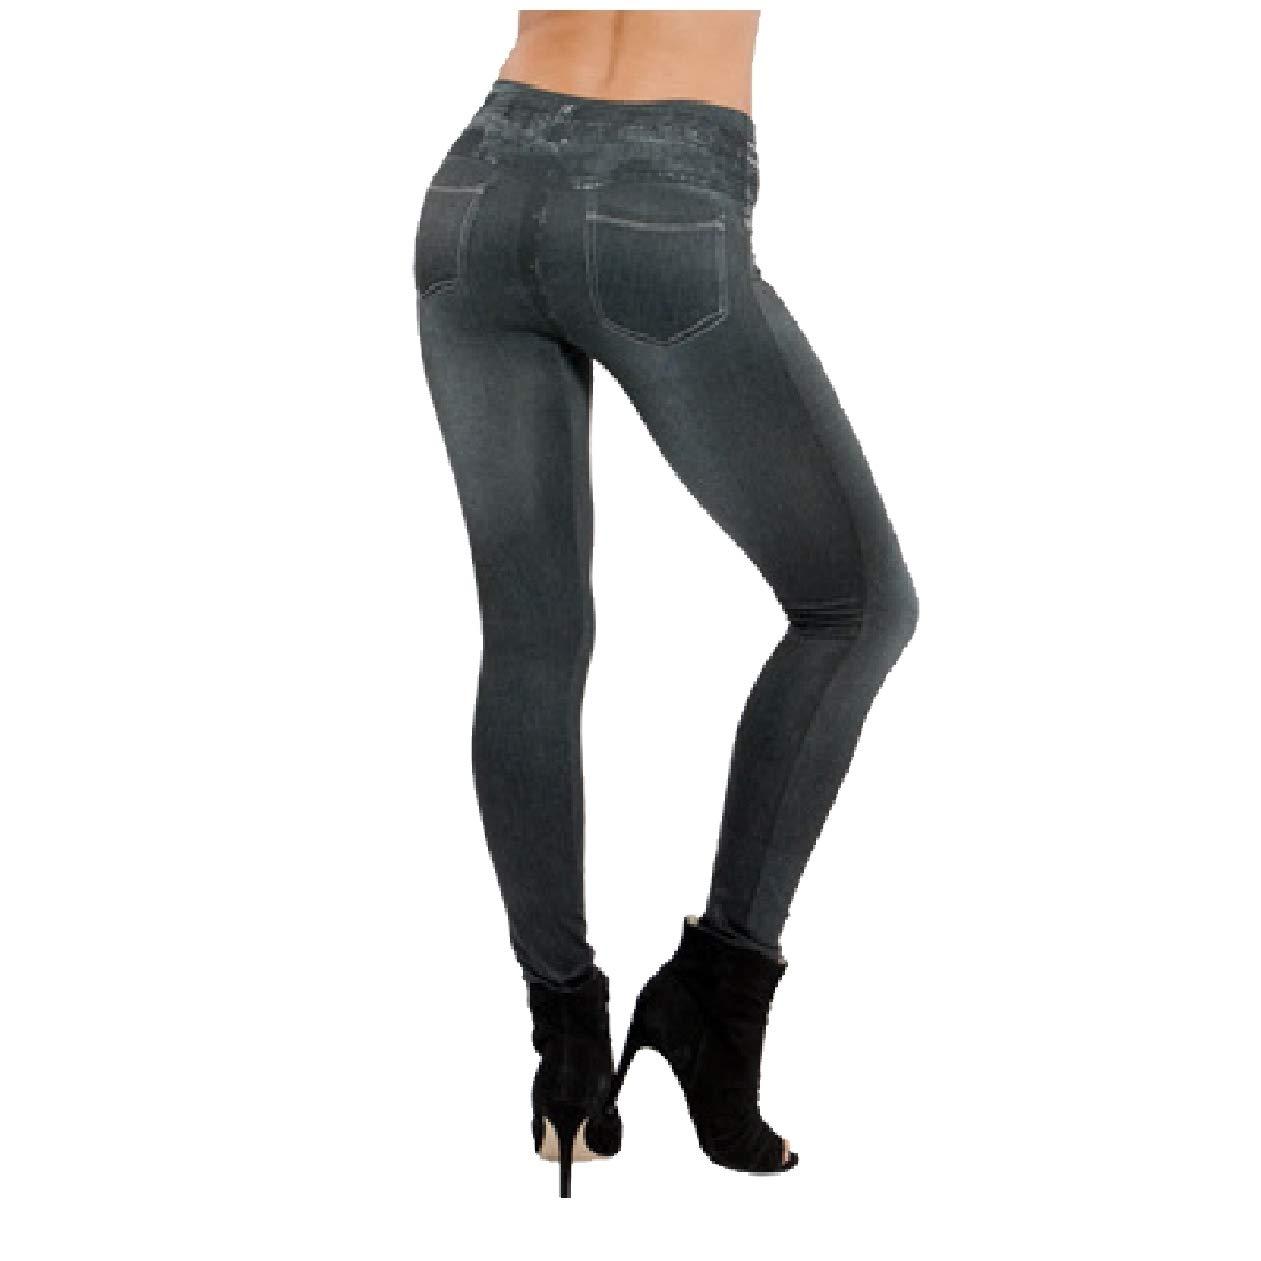 Tootless-Women Hip Enhancer Denim Jeggings Bodycon Highwaist Stretch Pants Black 2XL